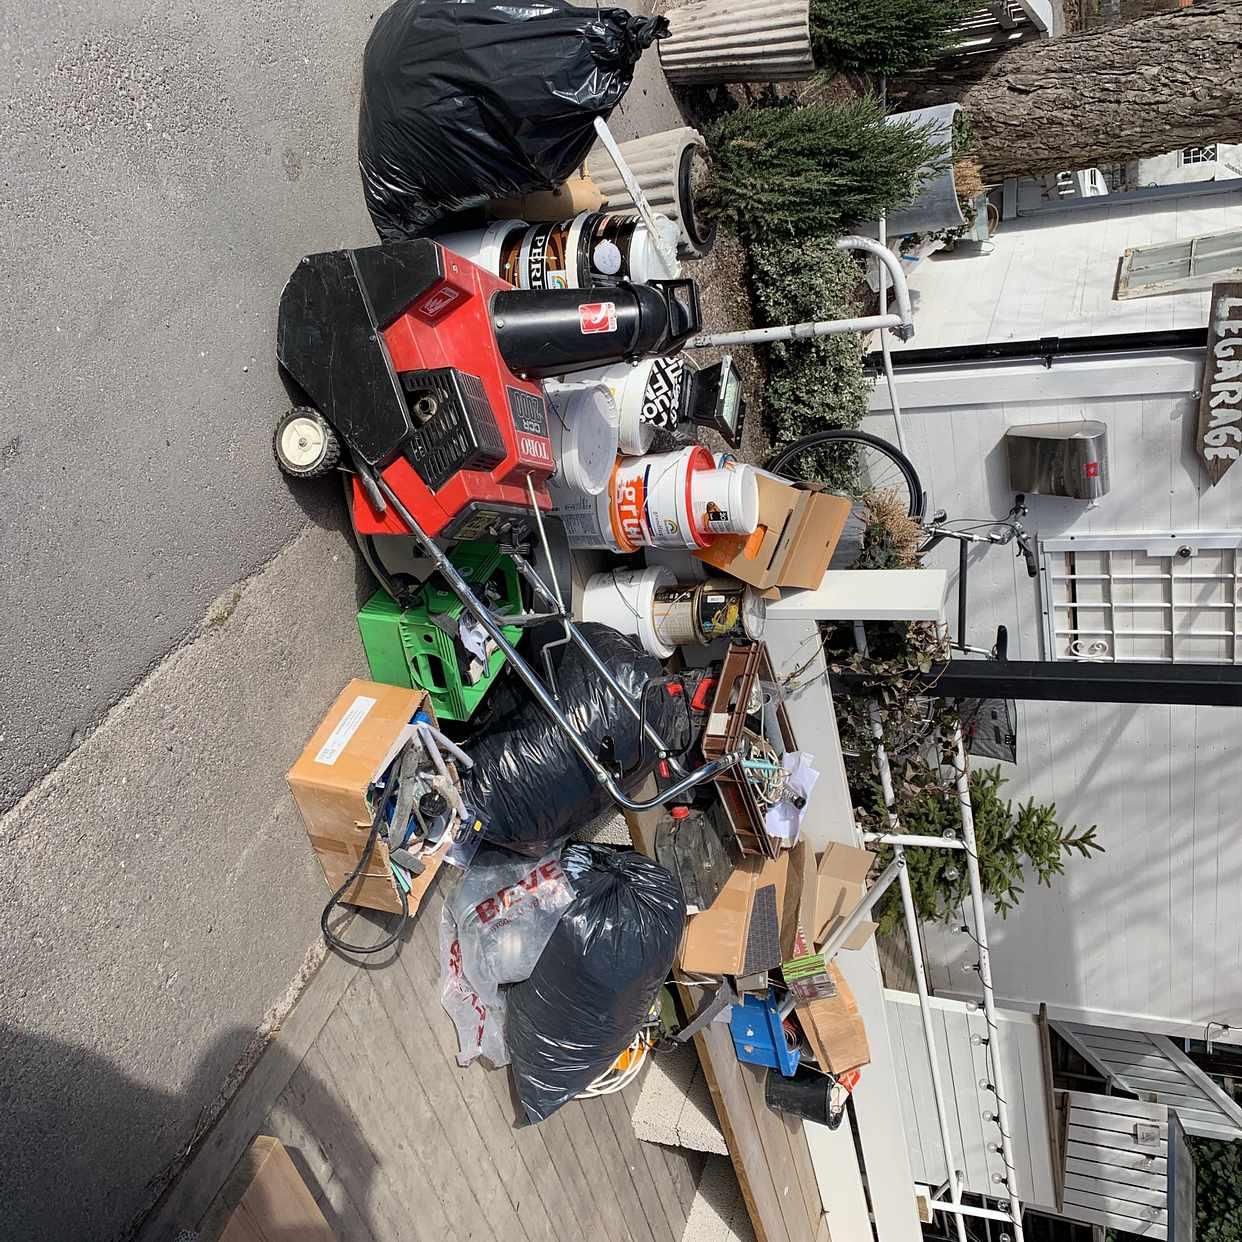 image of Bla avfall - Enskede